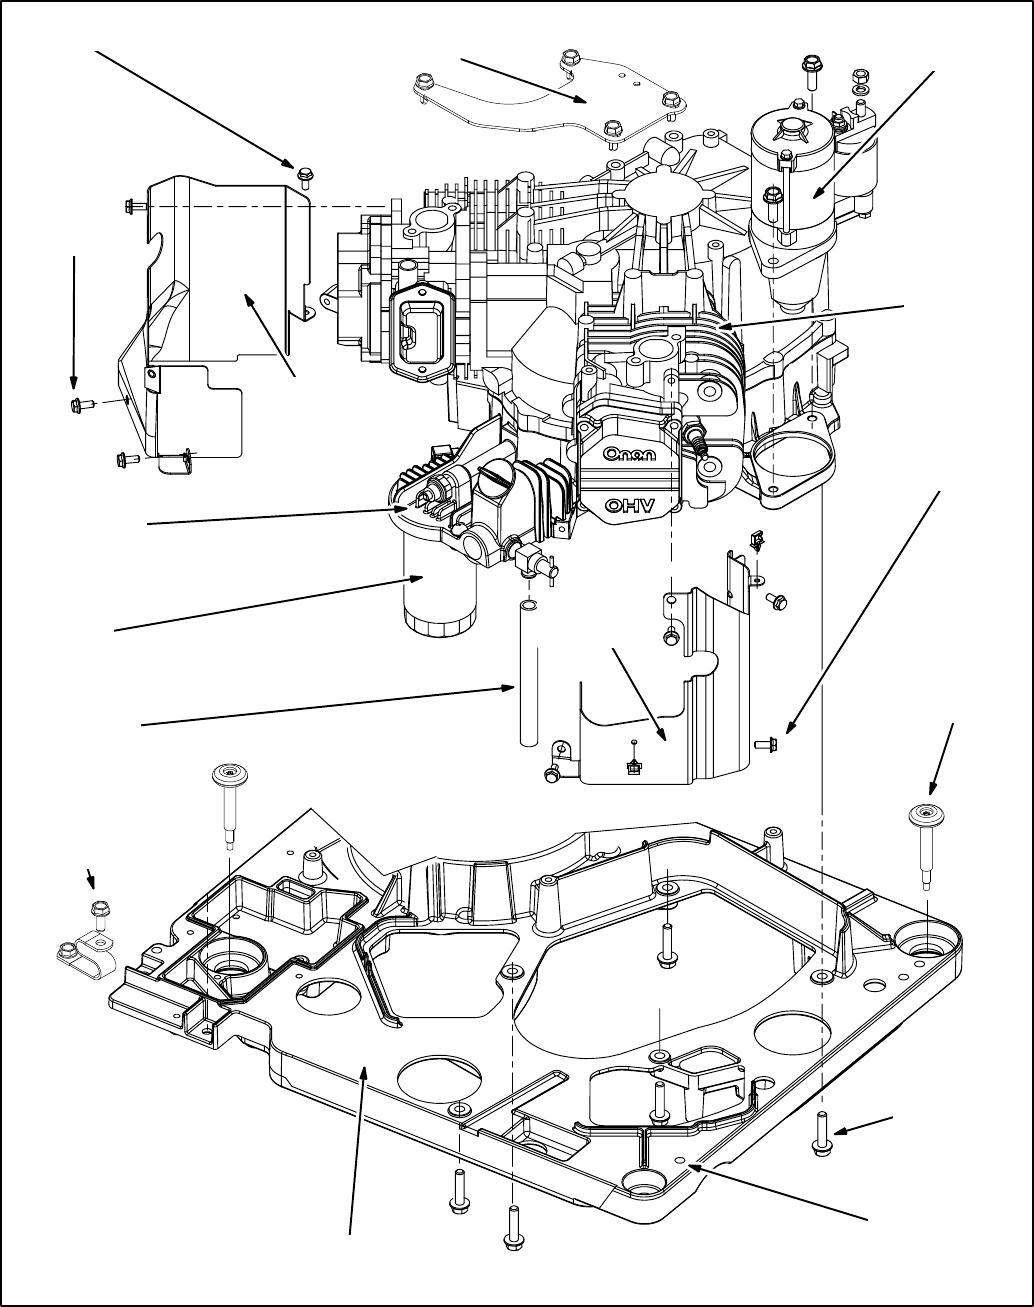 hight resolution of 480v single phase transformer to circuit breaker wiring diagram480v single phase transformer to circuit breaker wiring